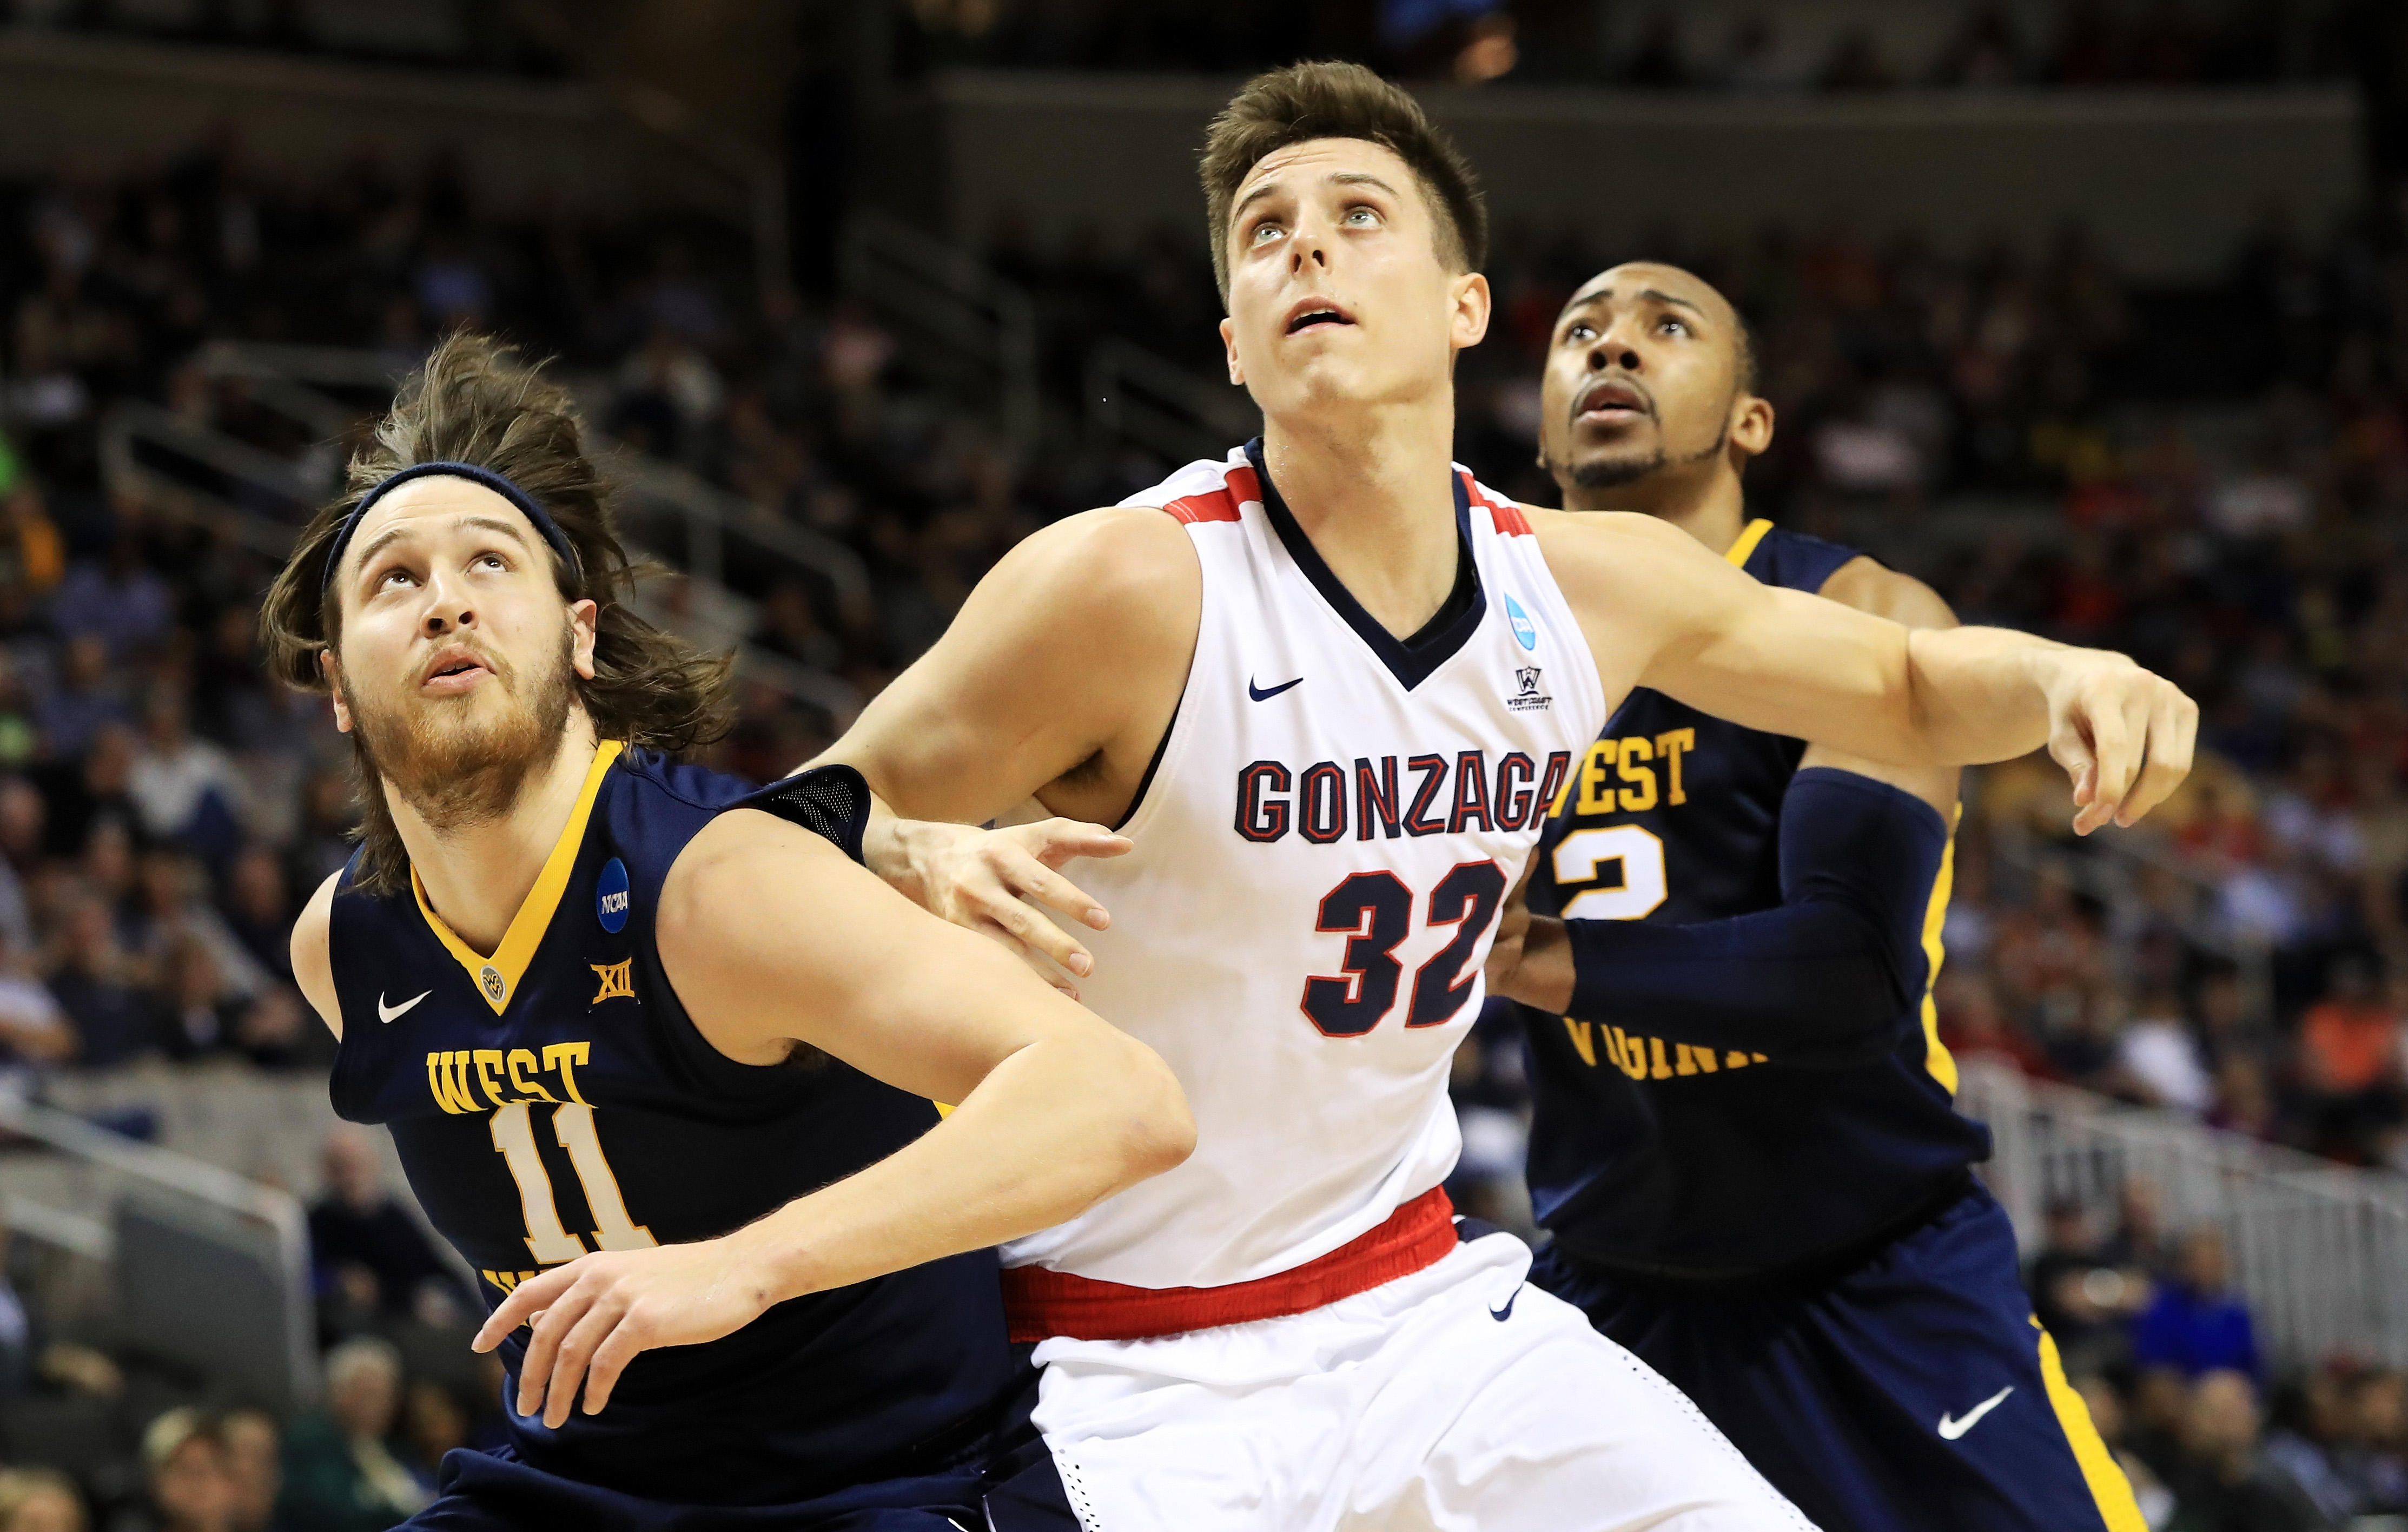 West Virginia v Gonzaga